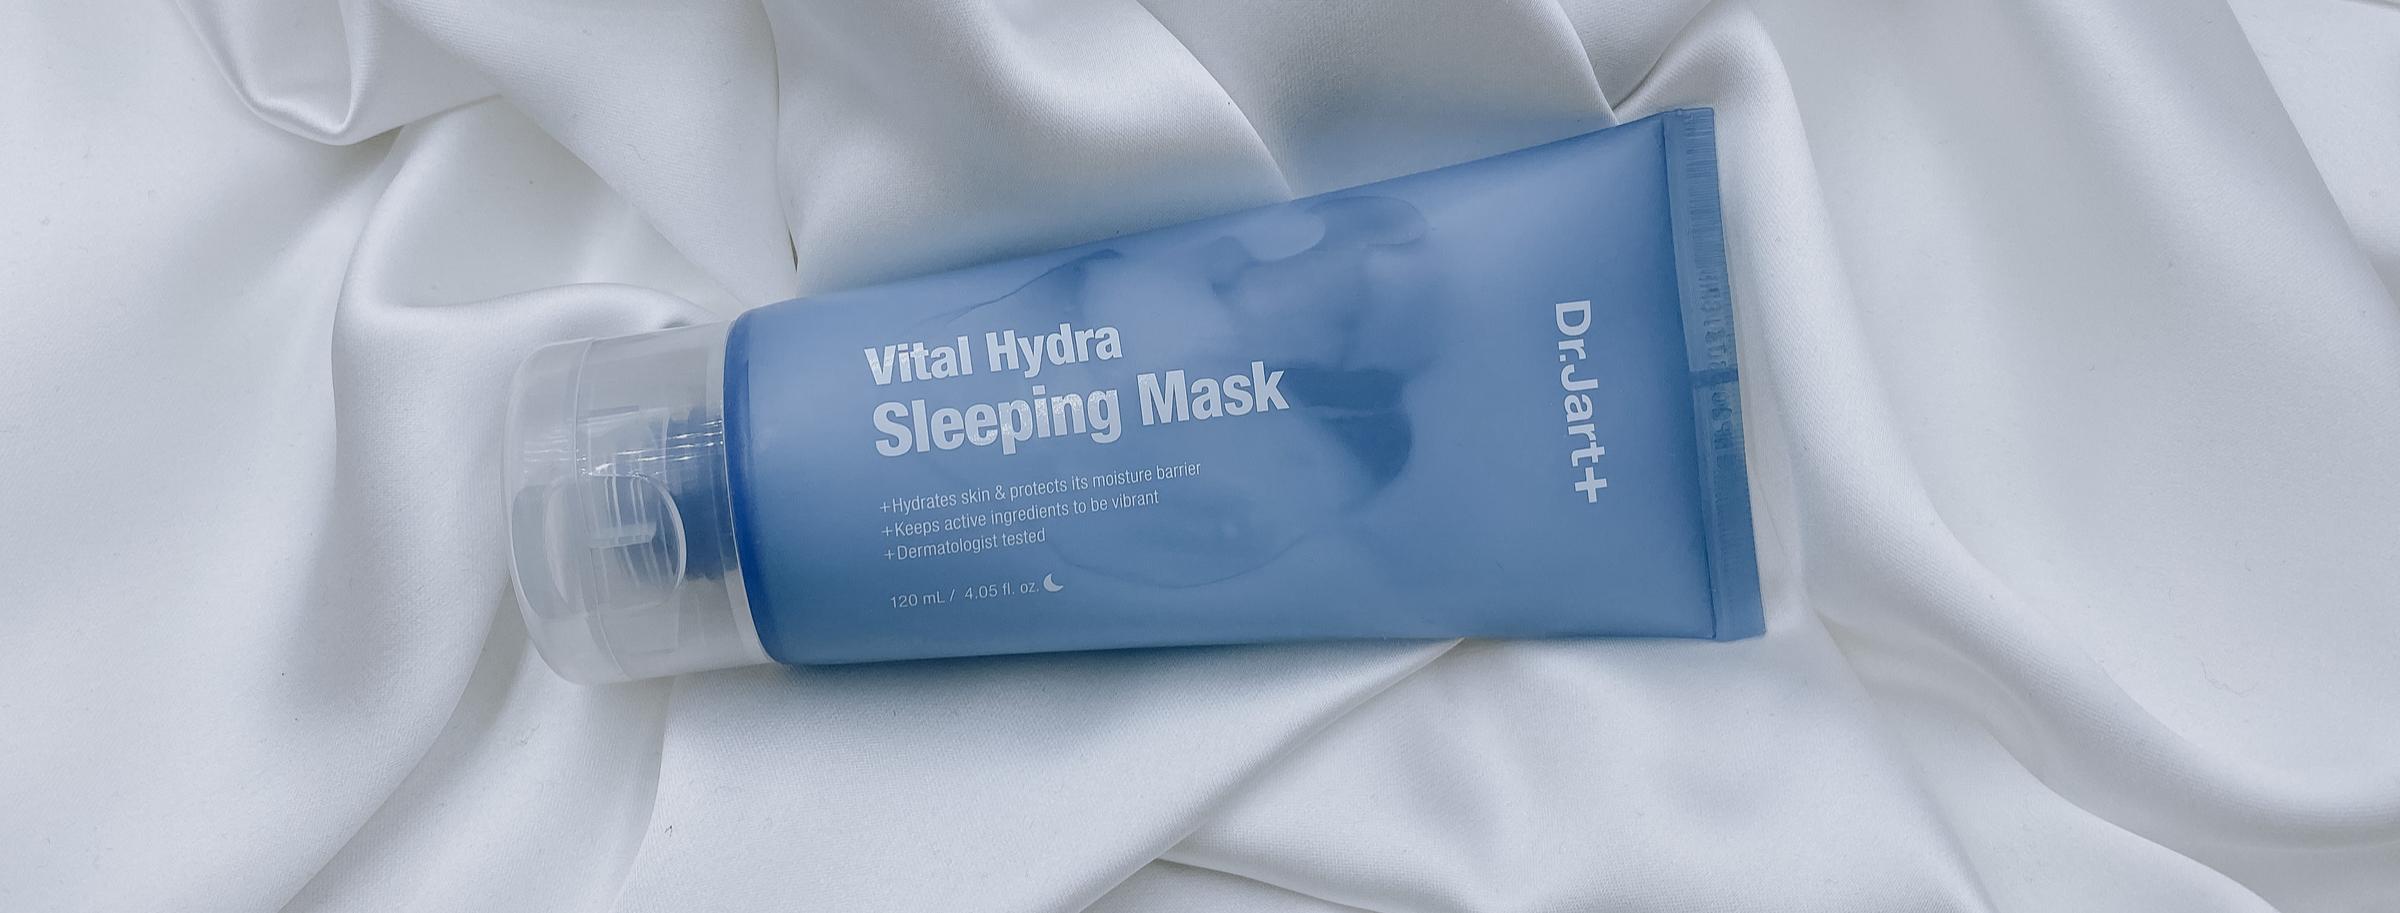 REVIEW | Dr Jart+ Water Jet Vital Hydra Sleeping Mask